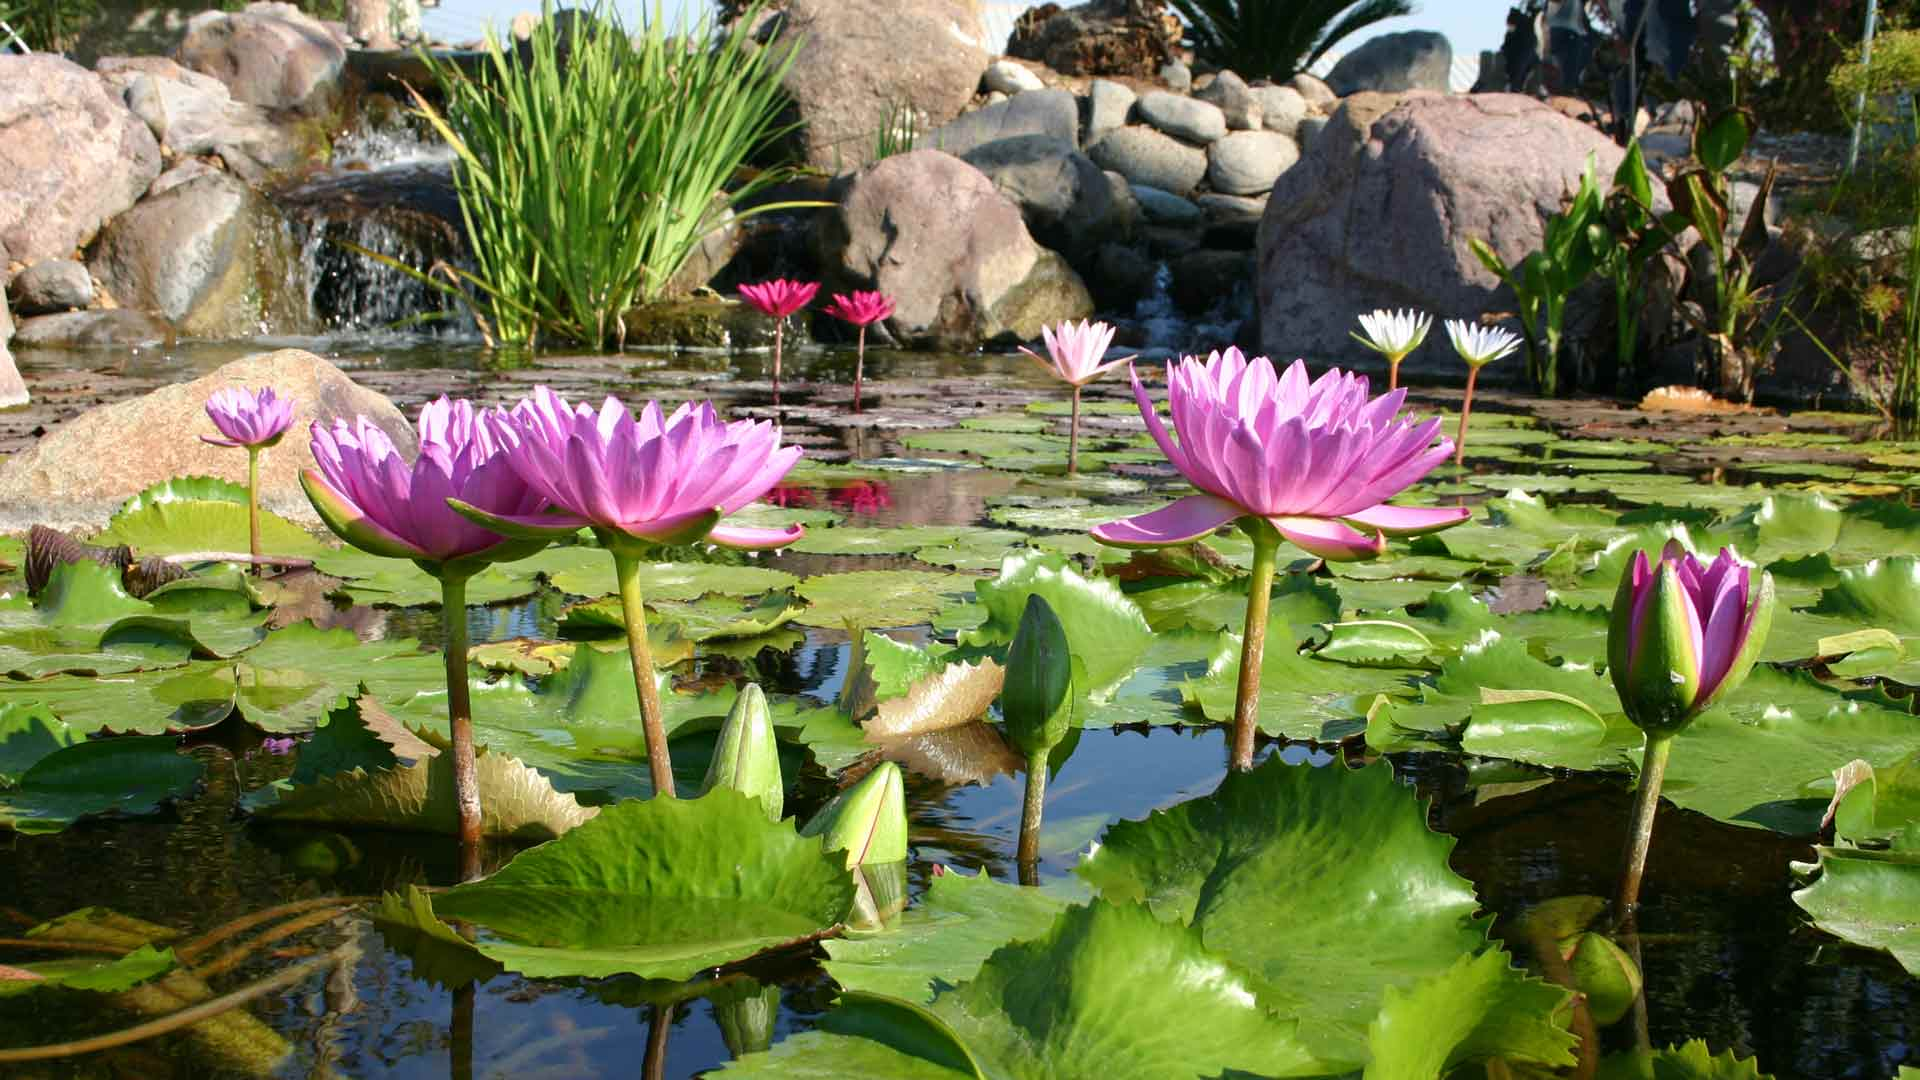 Auburn-Sky-Landscaping-Pond-Aquatic-Plants.jpg